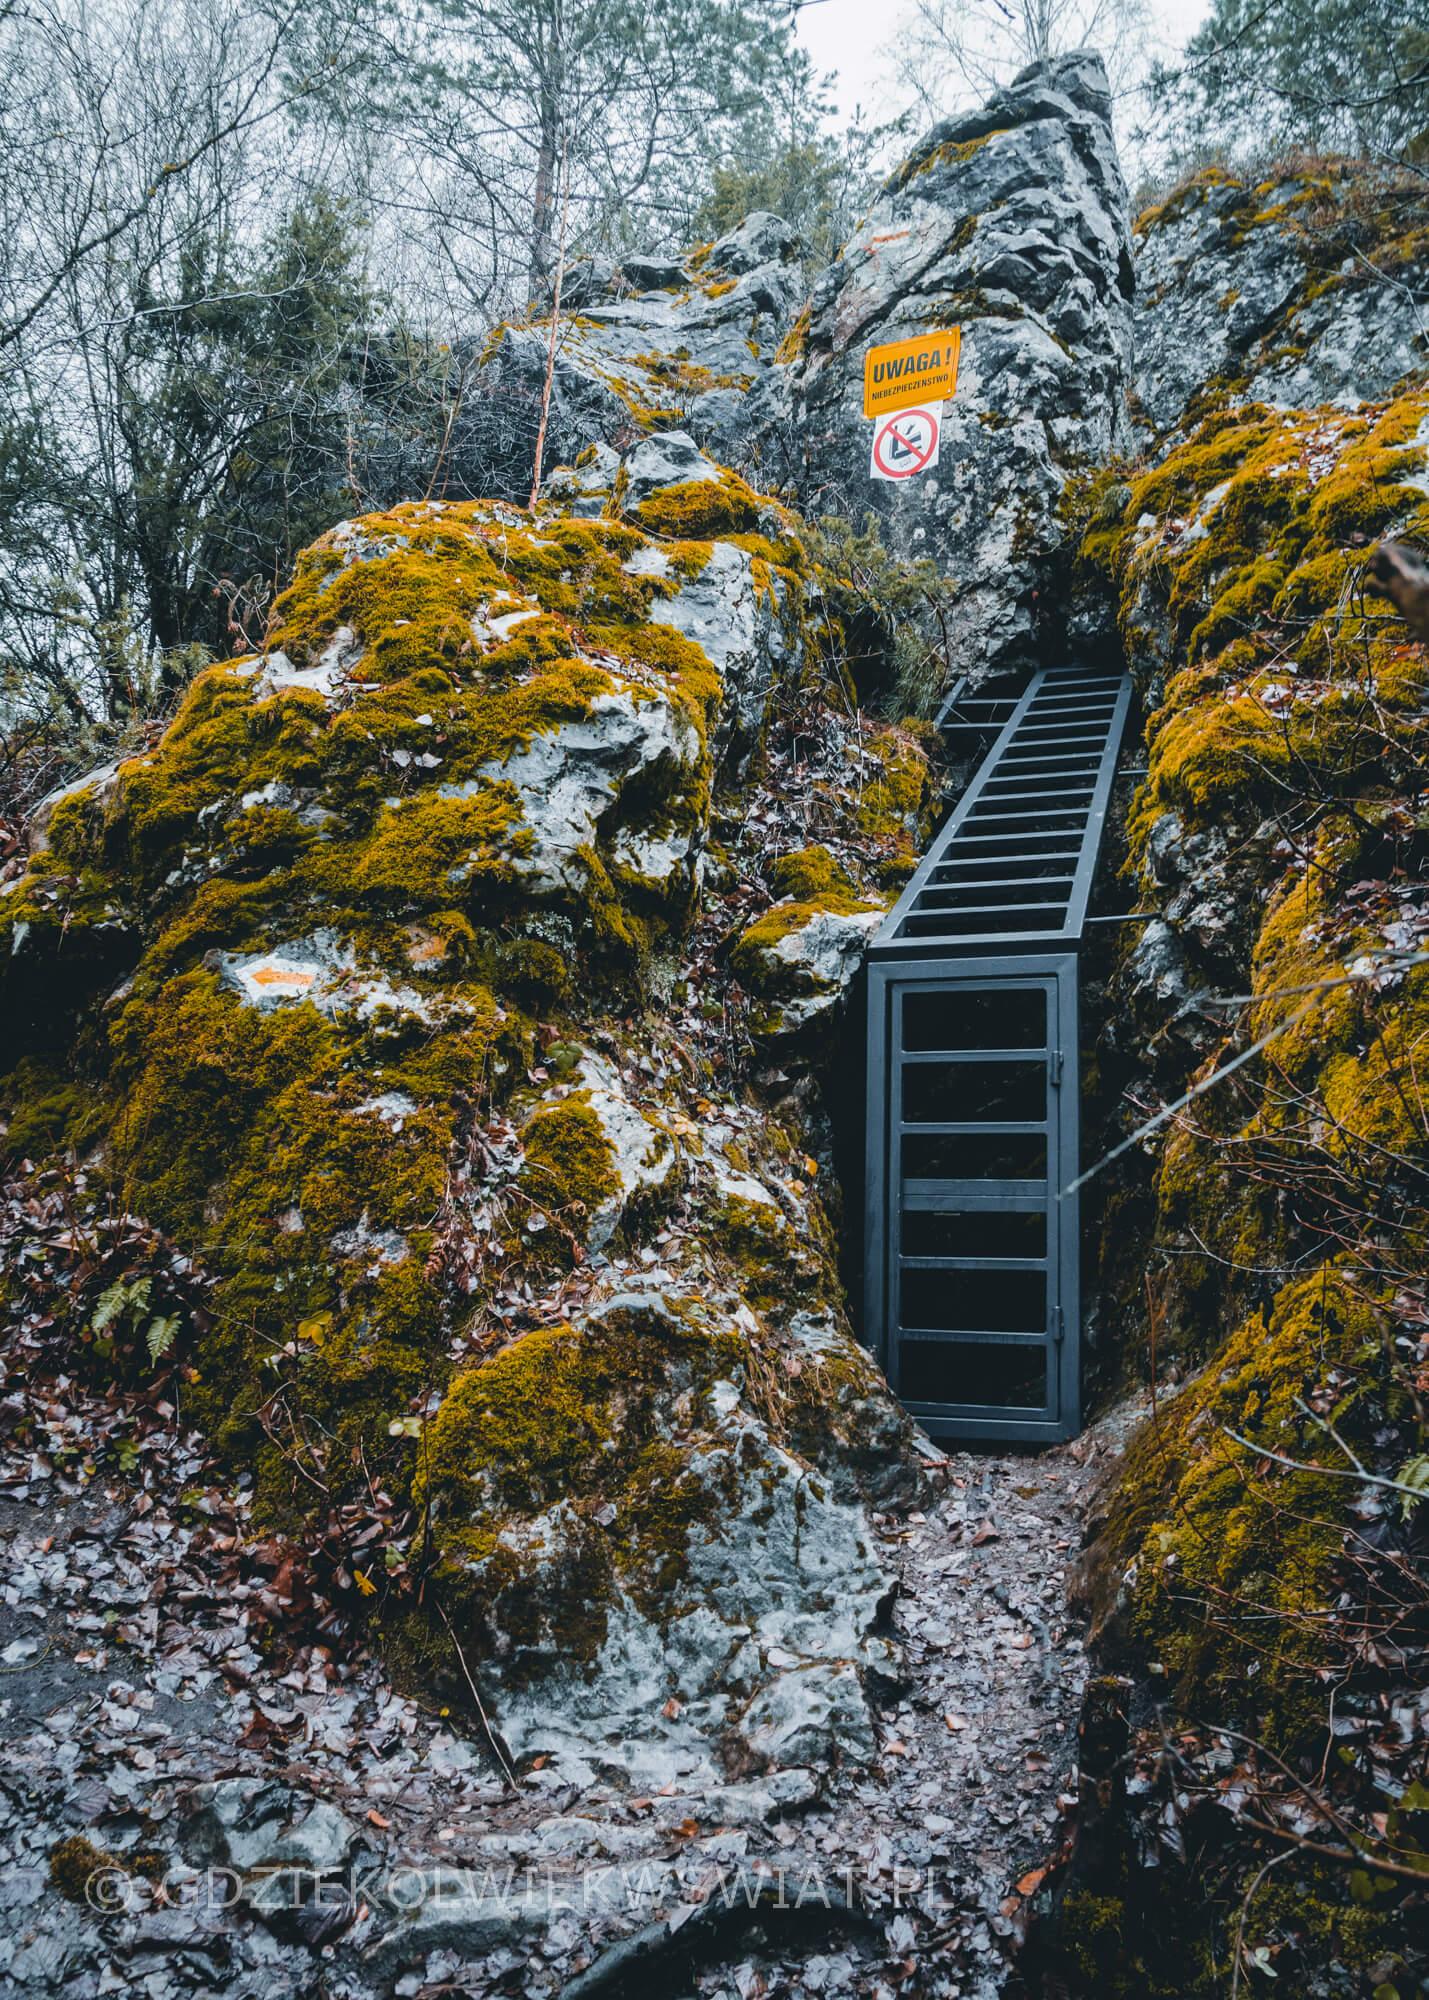 Góra Miedzianka jaskinia